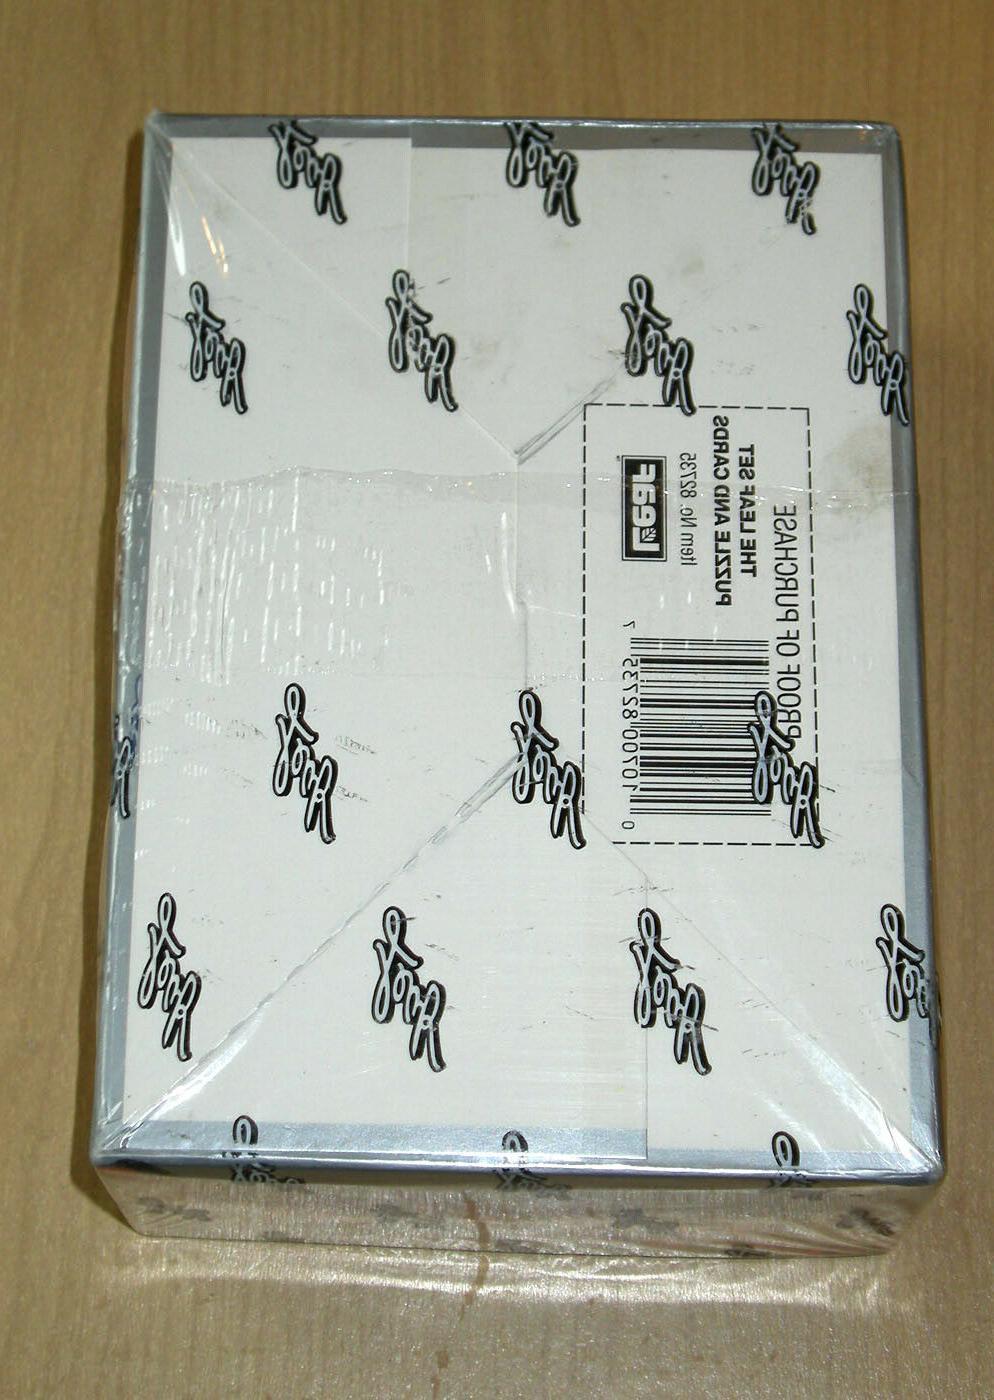 1990 series 1 wax foil 36-pack box Griffey? Sosa?